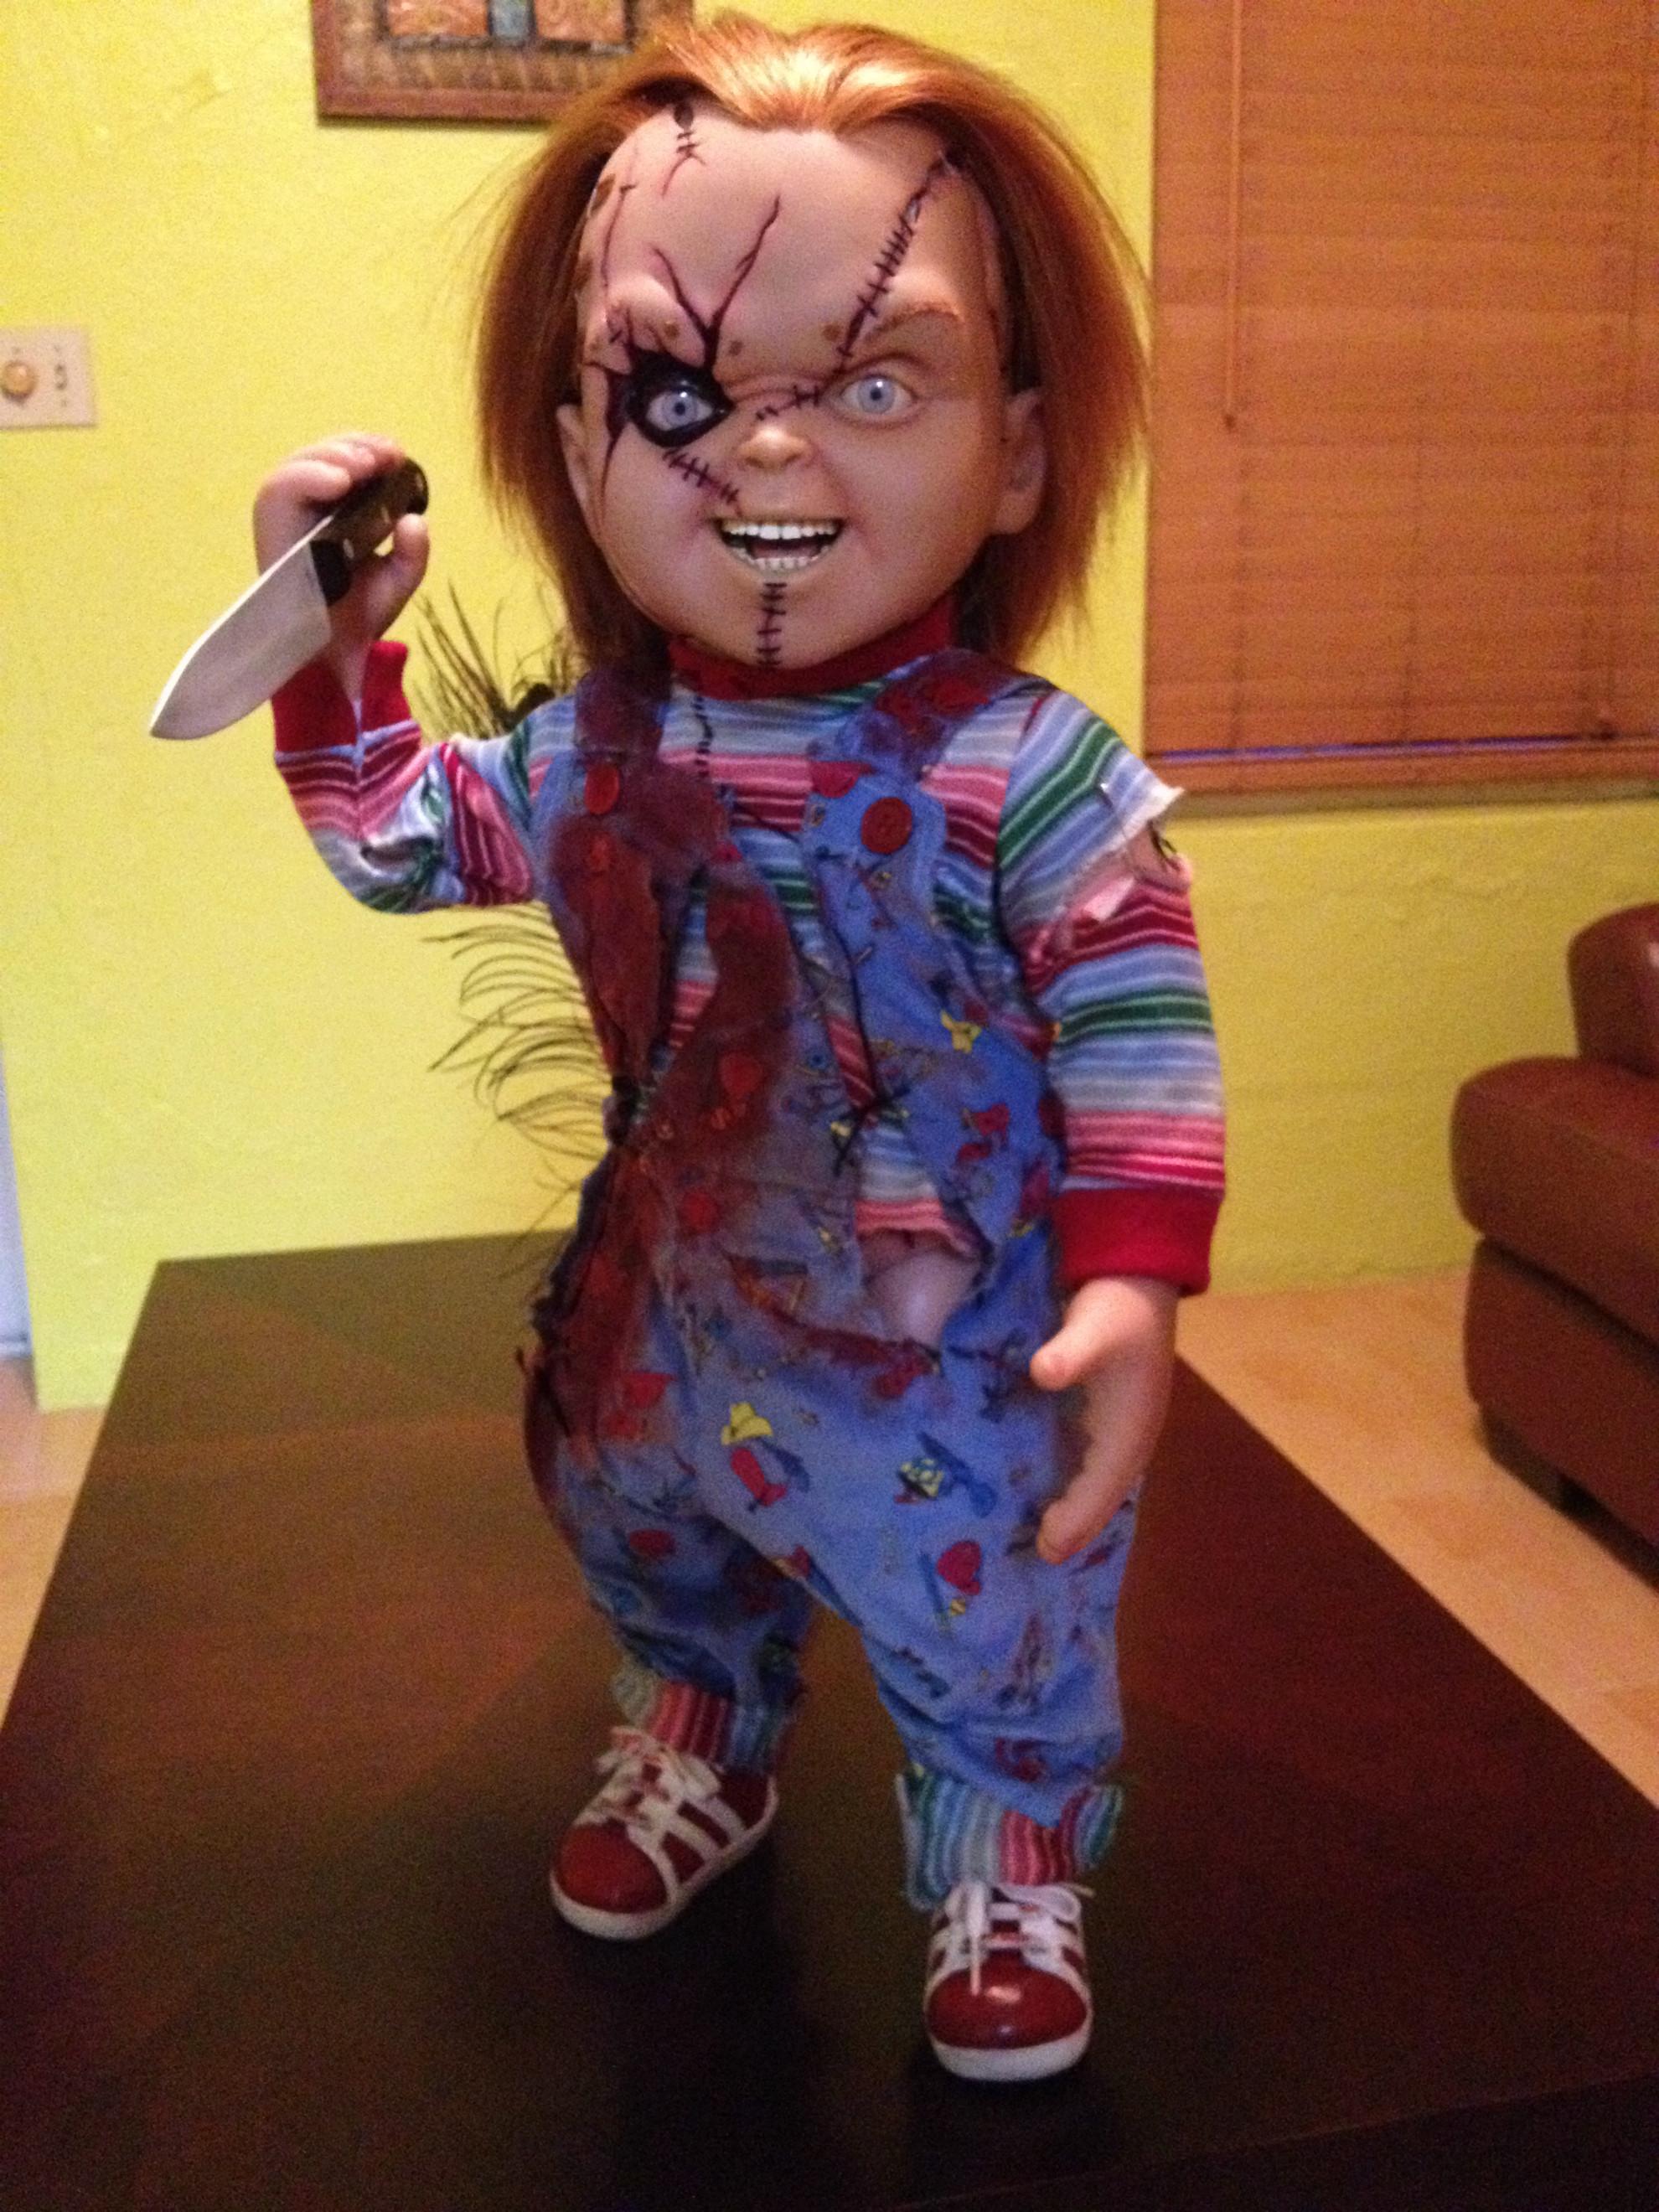 Life Size Chucky Doll by jayrbermuda Life Size Chucky Doll by jayrbermuda